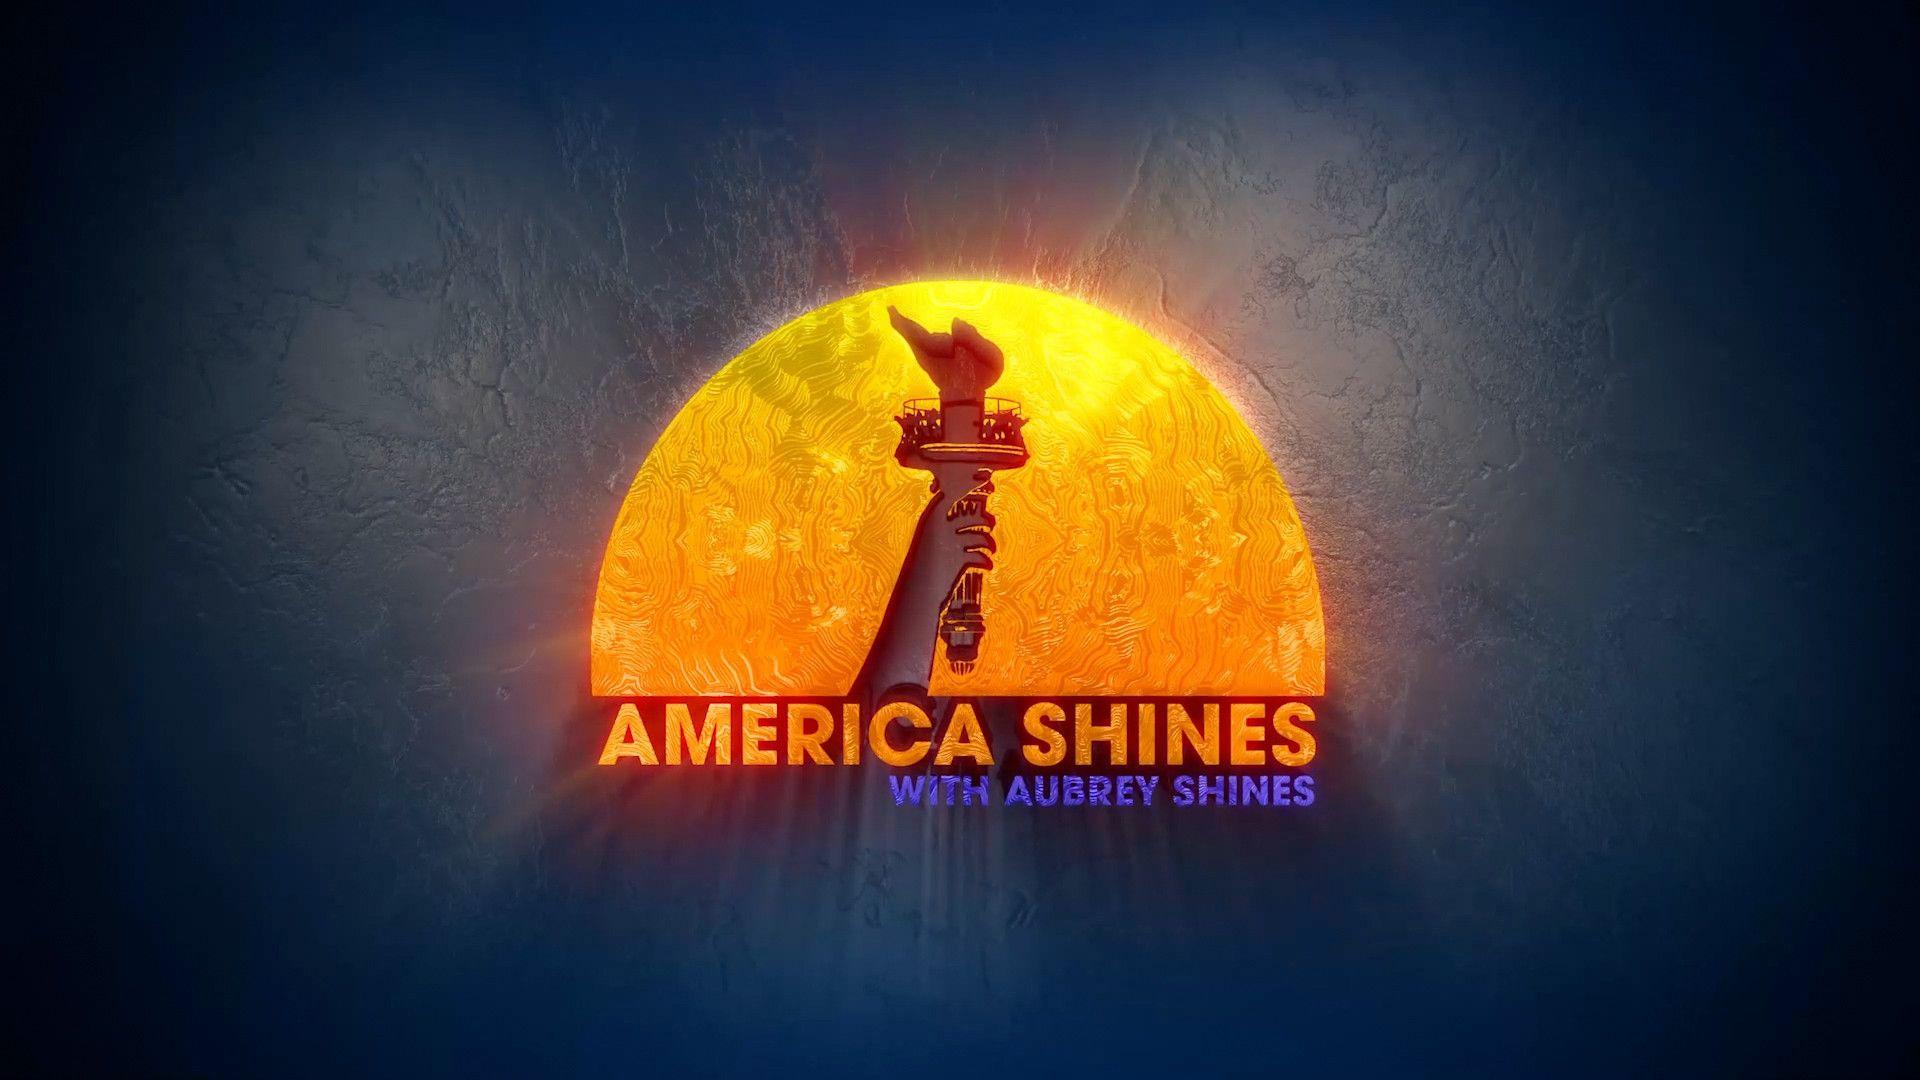 America Shines